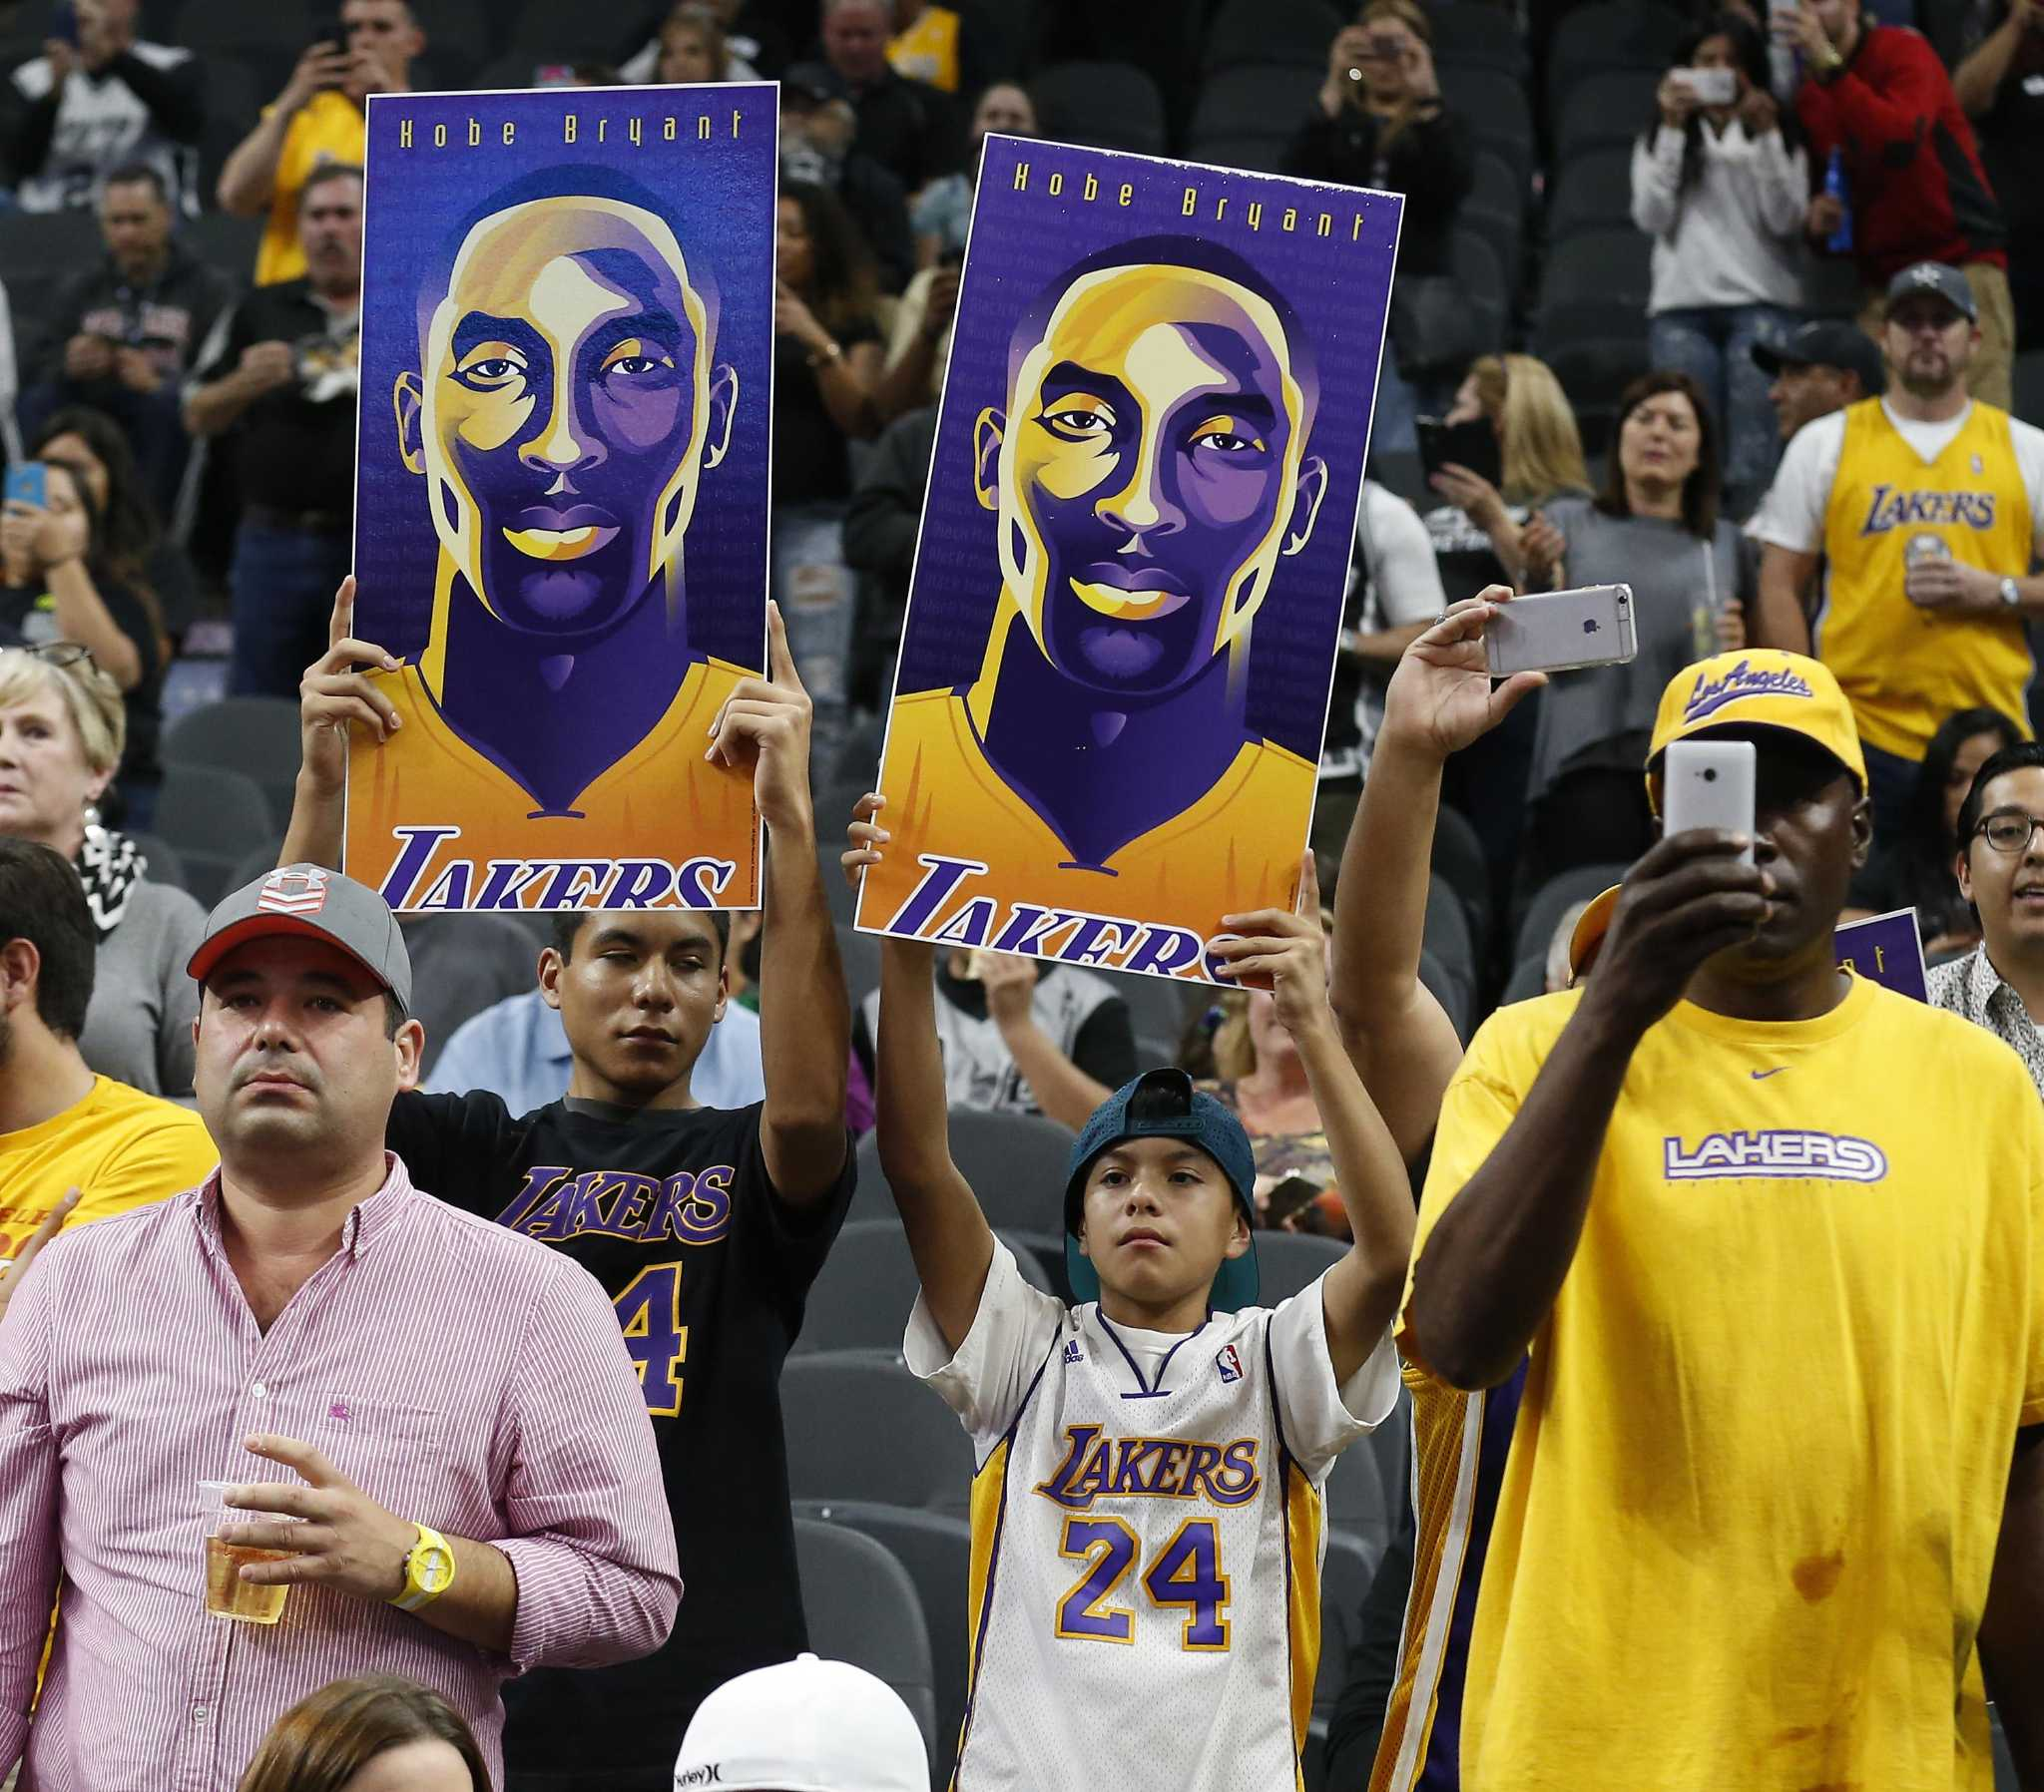 f58d9d3c627 How Kobe Bryant influenced the Warriors  All-Stars - SFGate